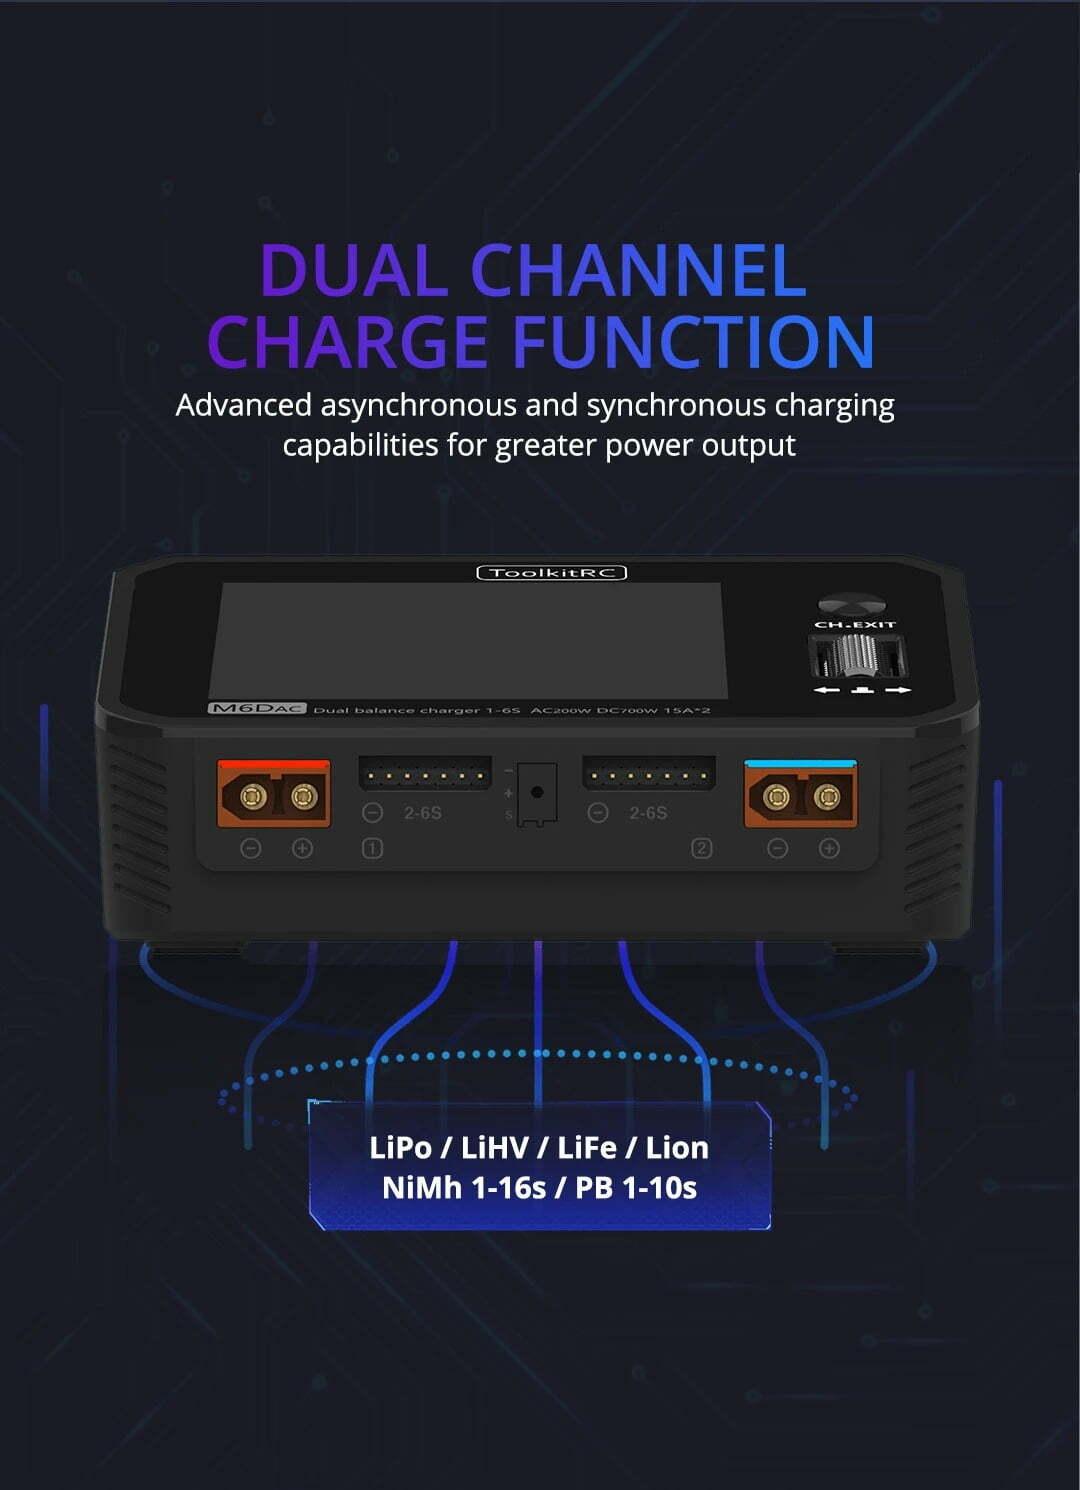 ToolkitRC M6DAC Dual Smart Charger DC 700W AC 200W description power